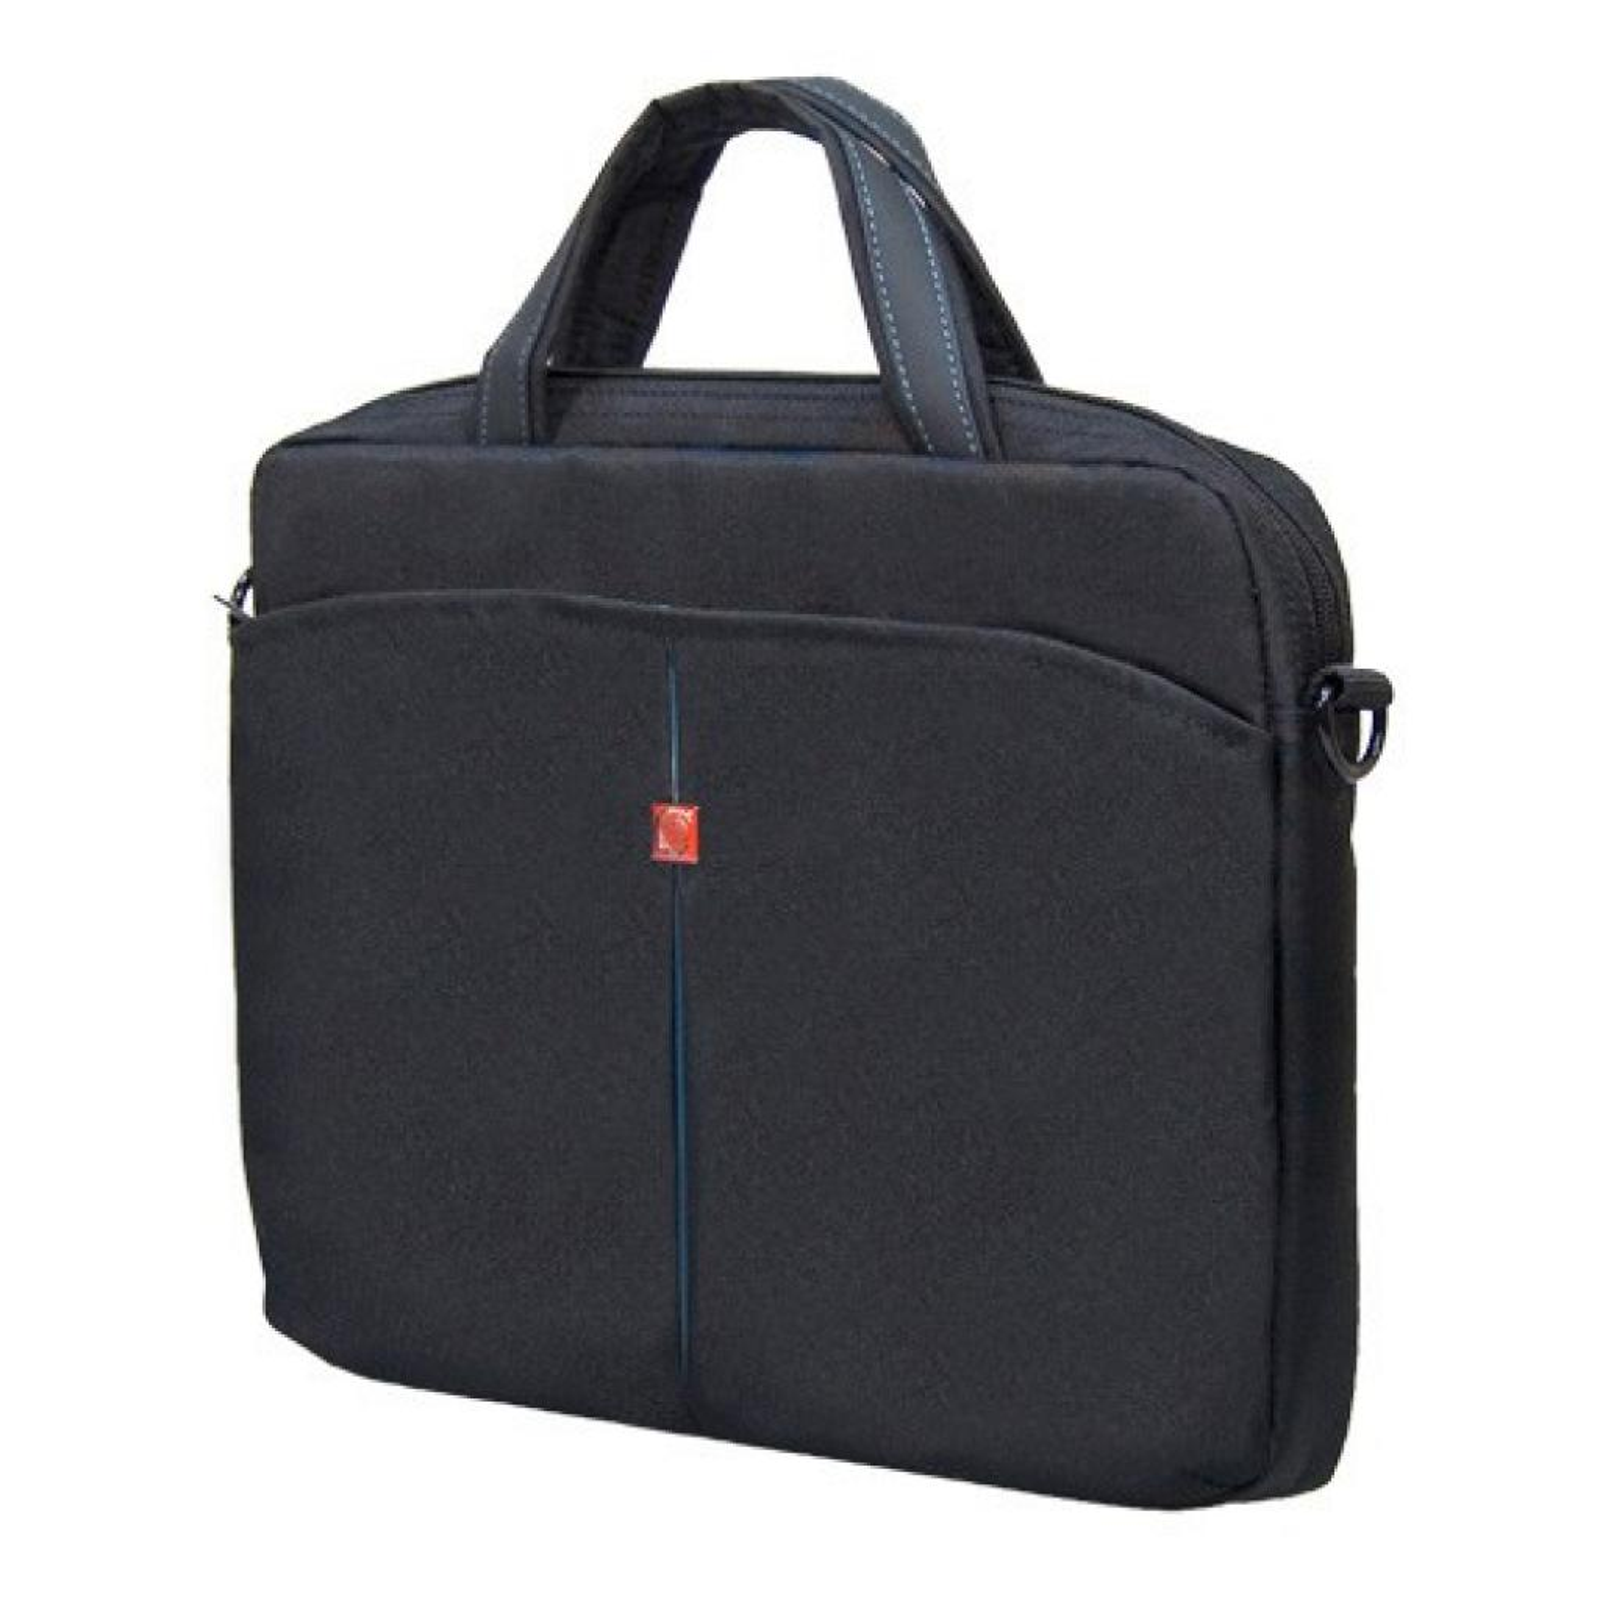 Сумка для ноутбука Continent 13.3 CC-013 Black (CC-013 Black)